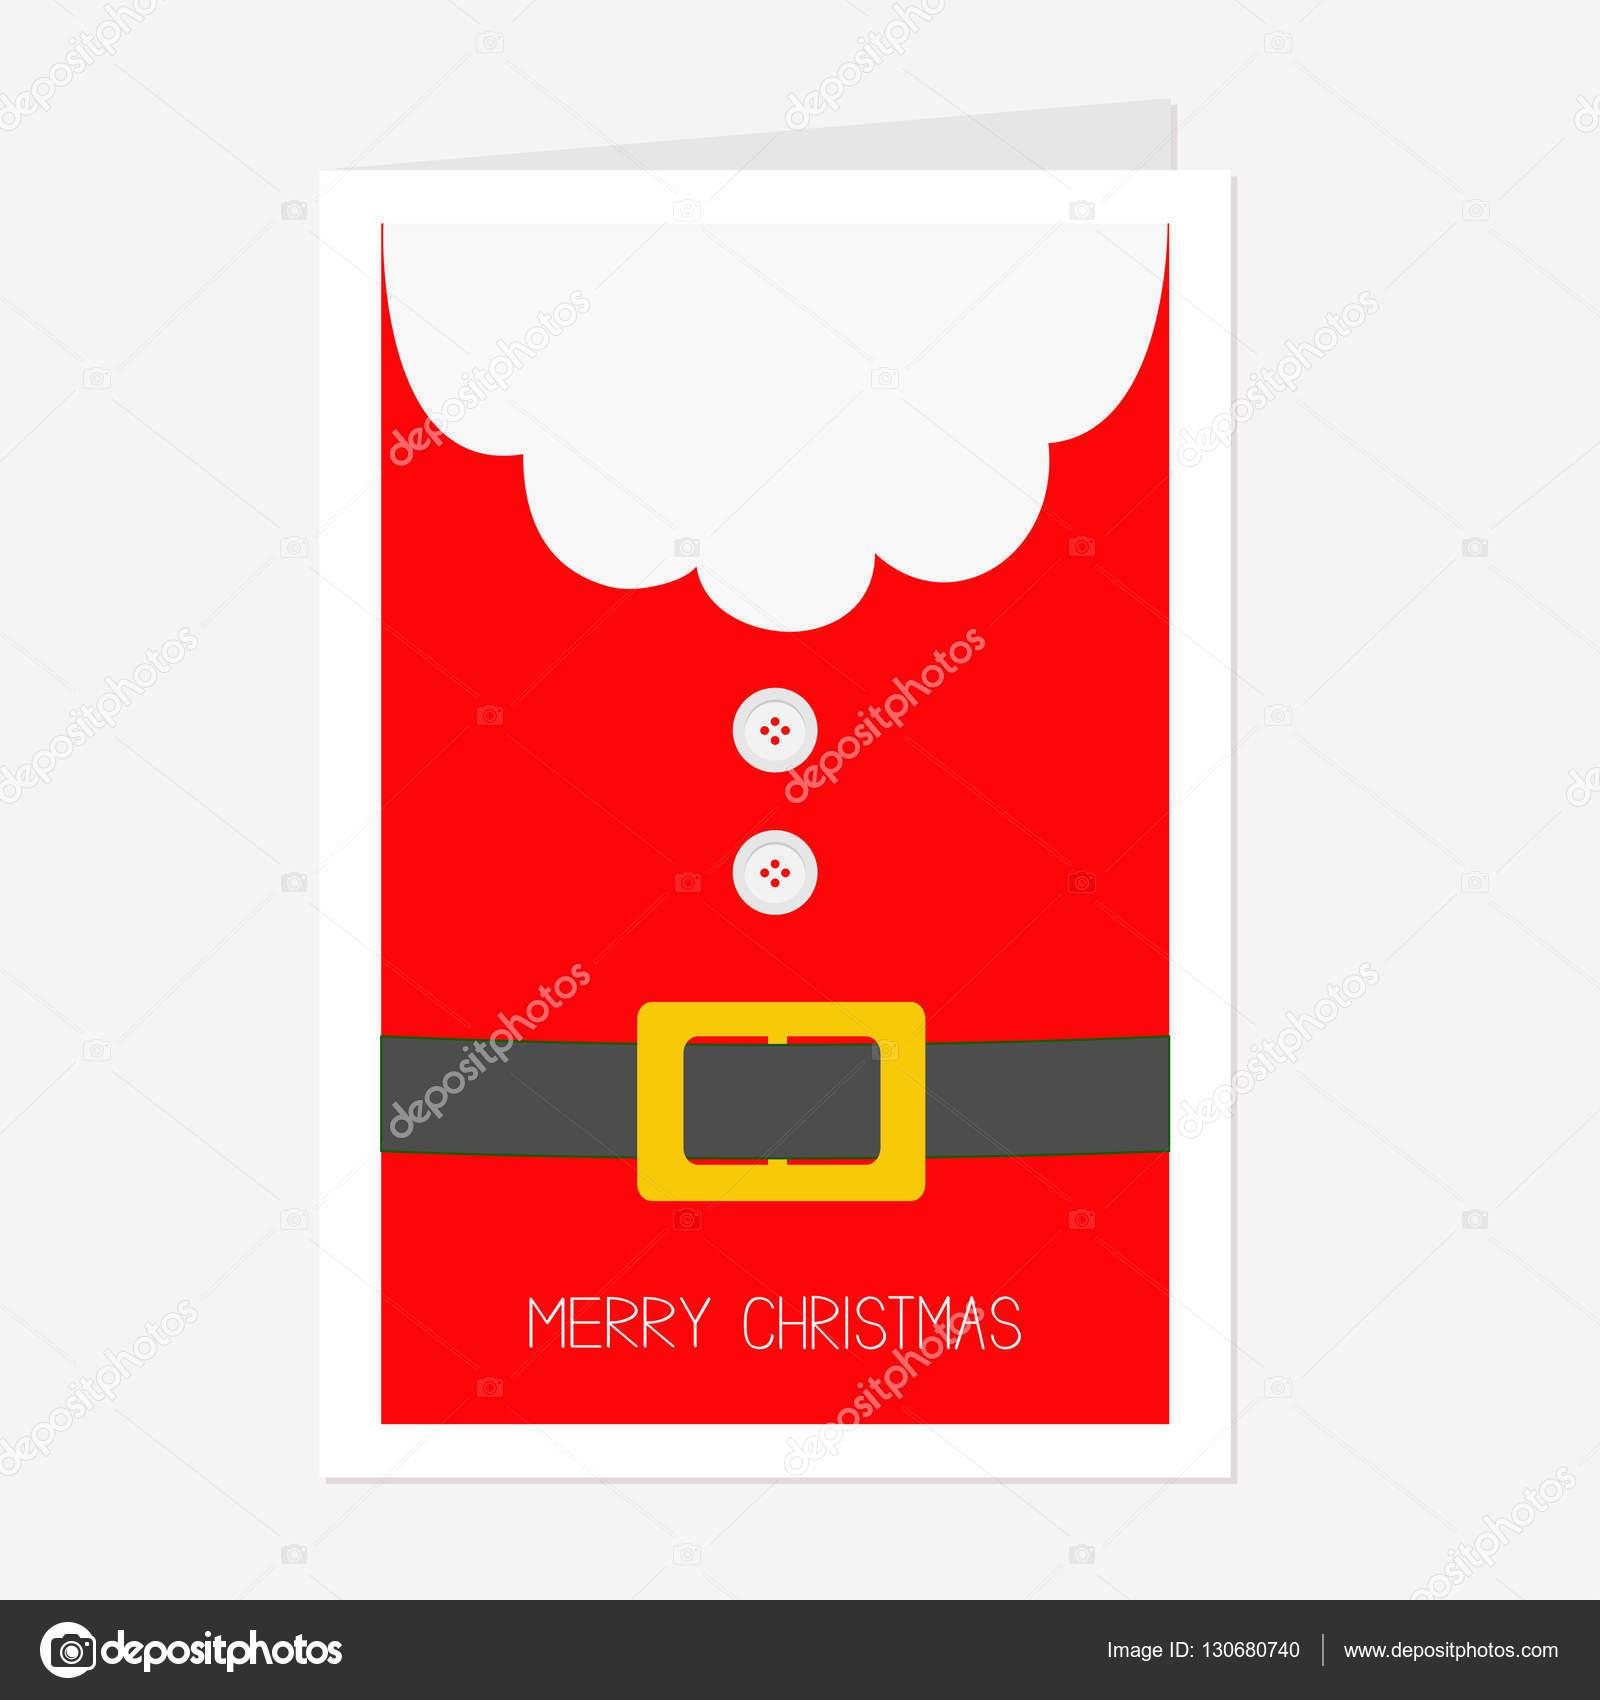 santa claus coat with belt stock vector - Santa Claus Coat